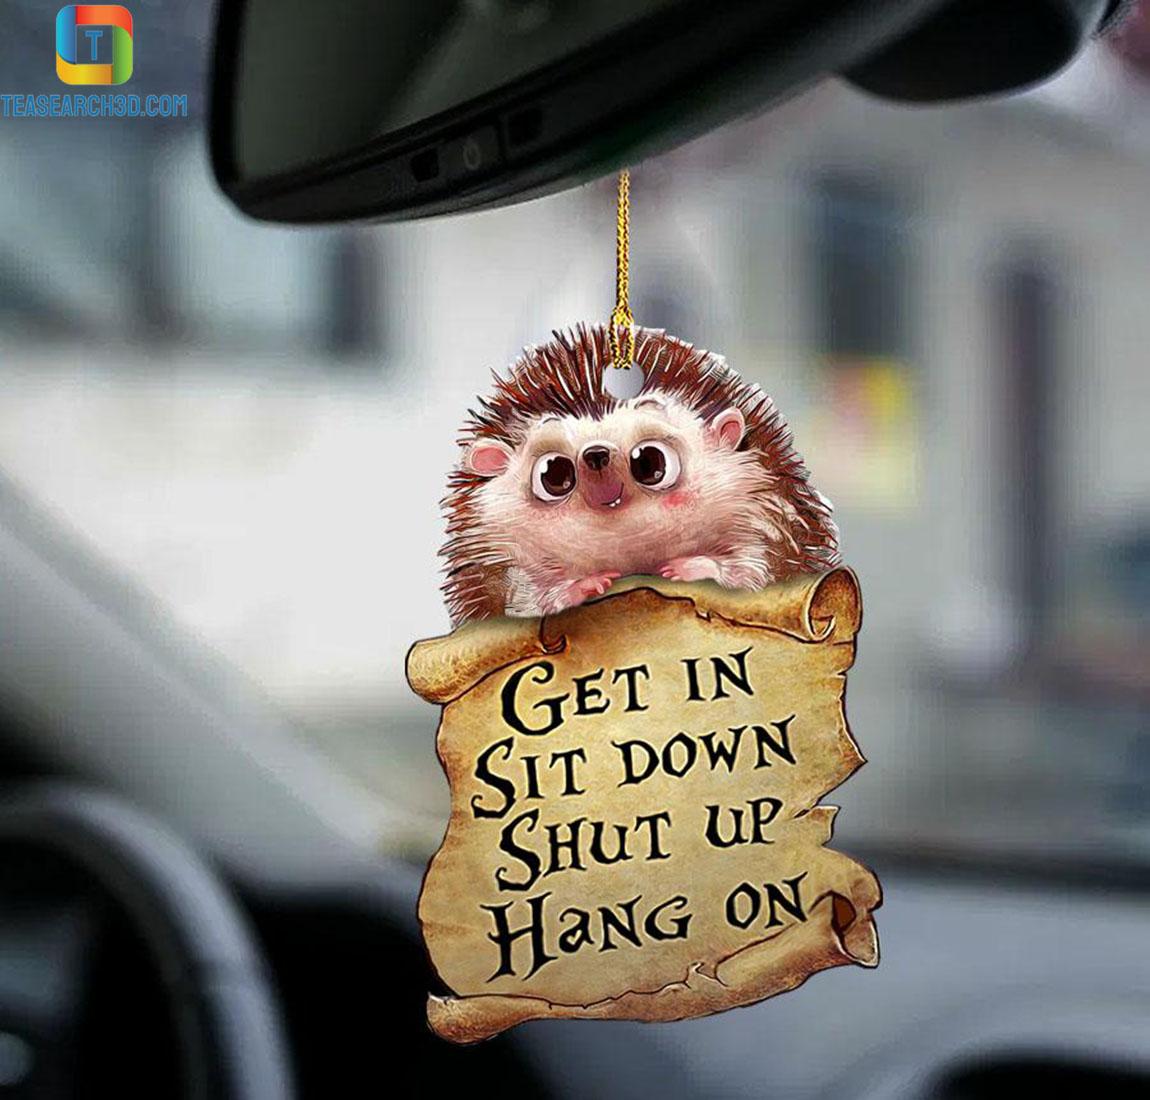 Hedgehog get in sit down shut up hang on car hanging ornament